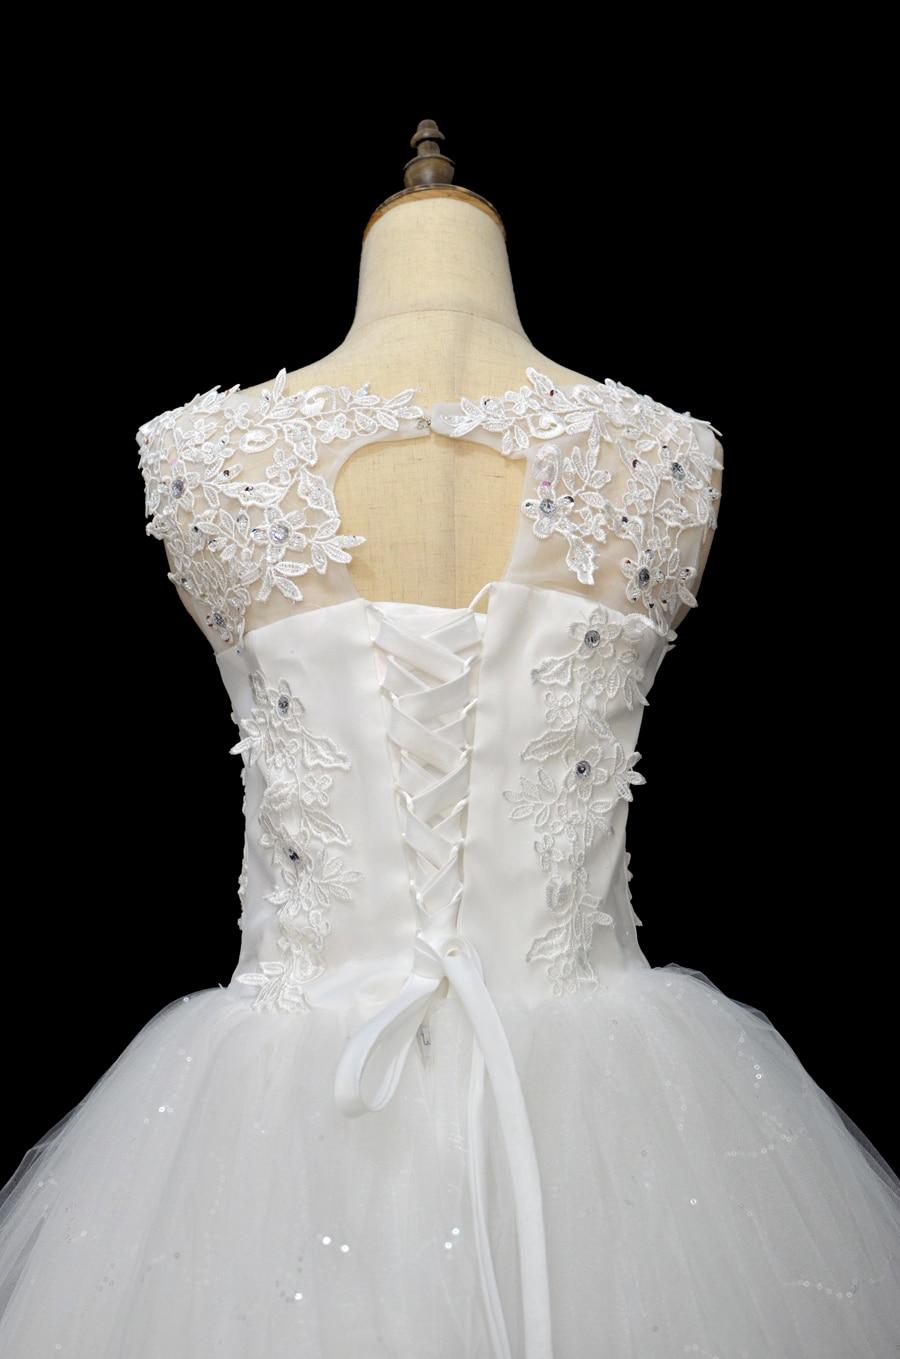 Coreeană Lace Up Ball rochie de calitate rochii de mireasa 2018 - Rochii de mireasa - Fotografie 5